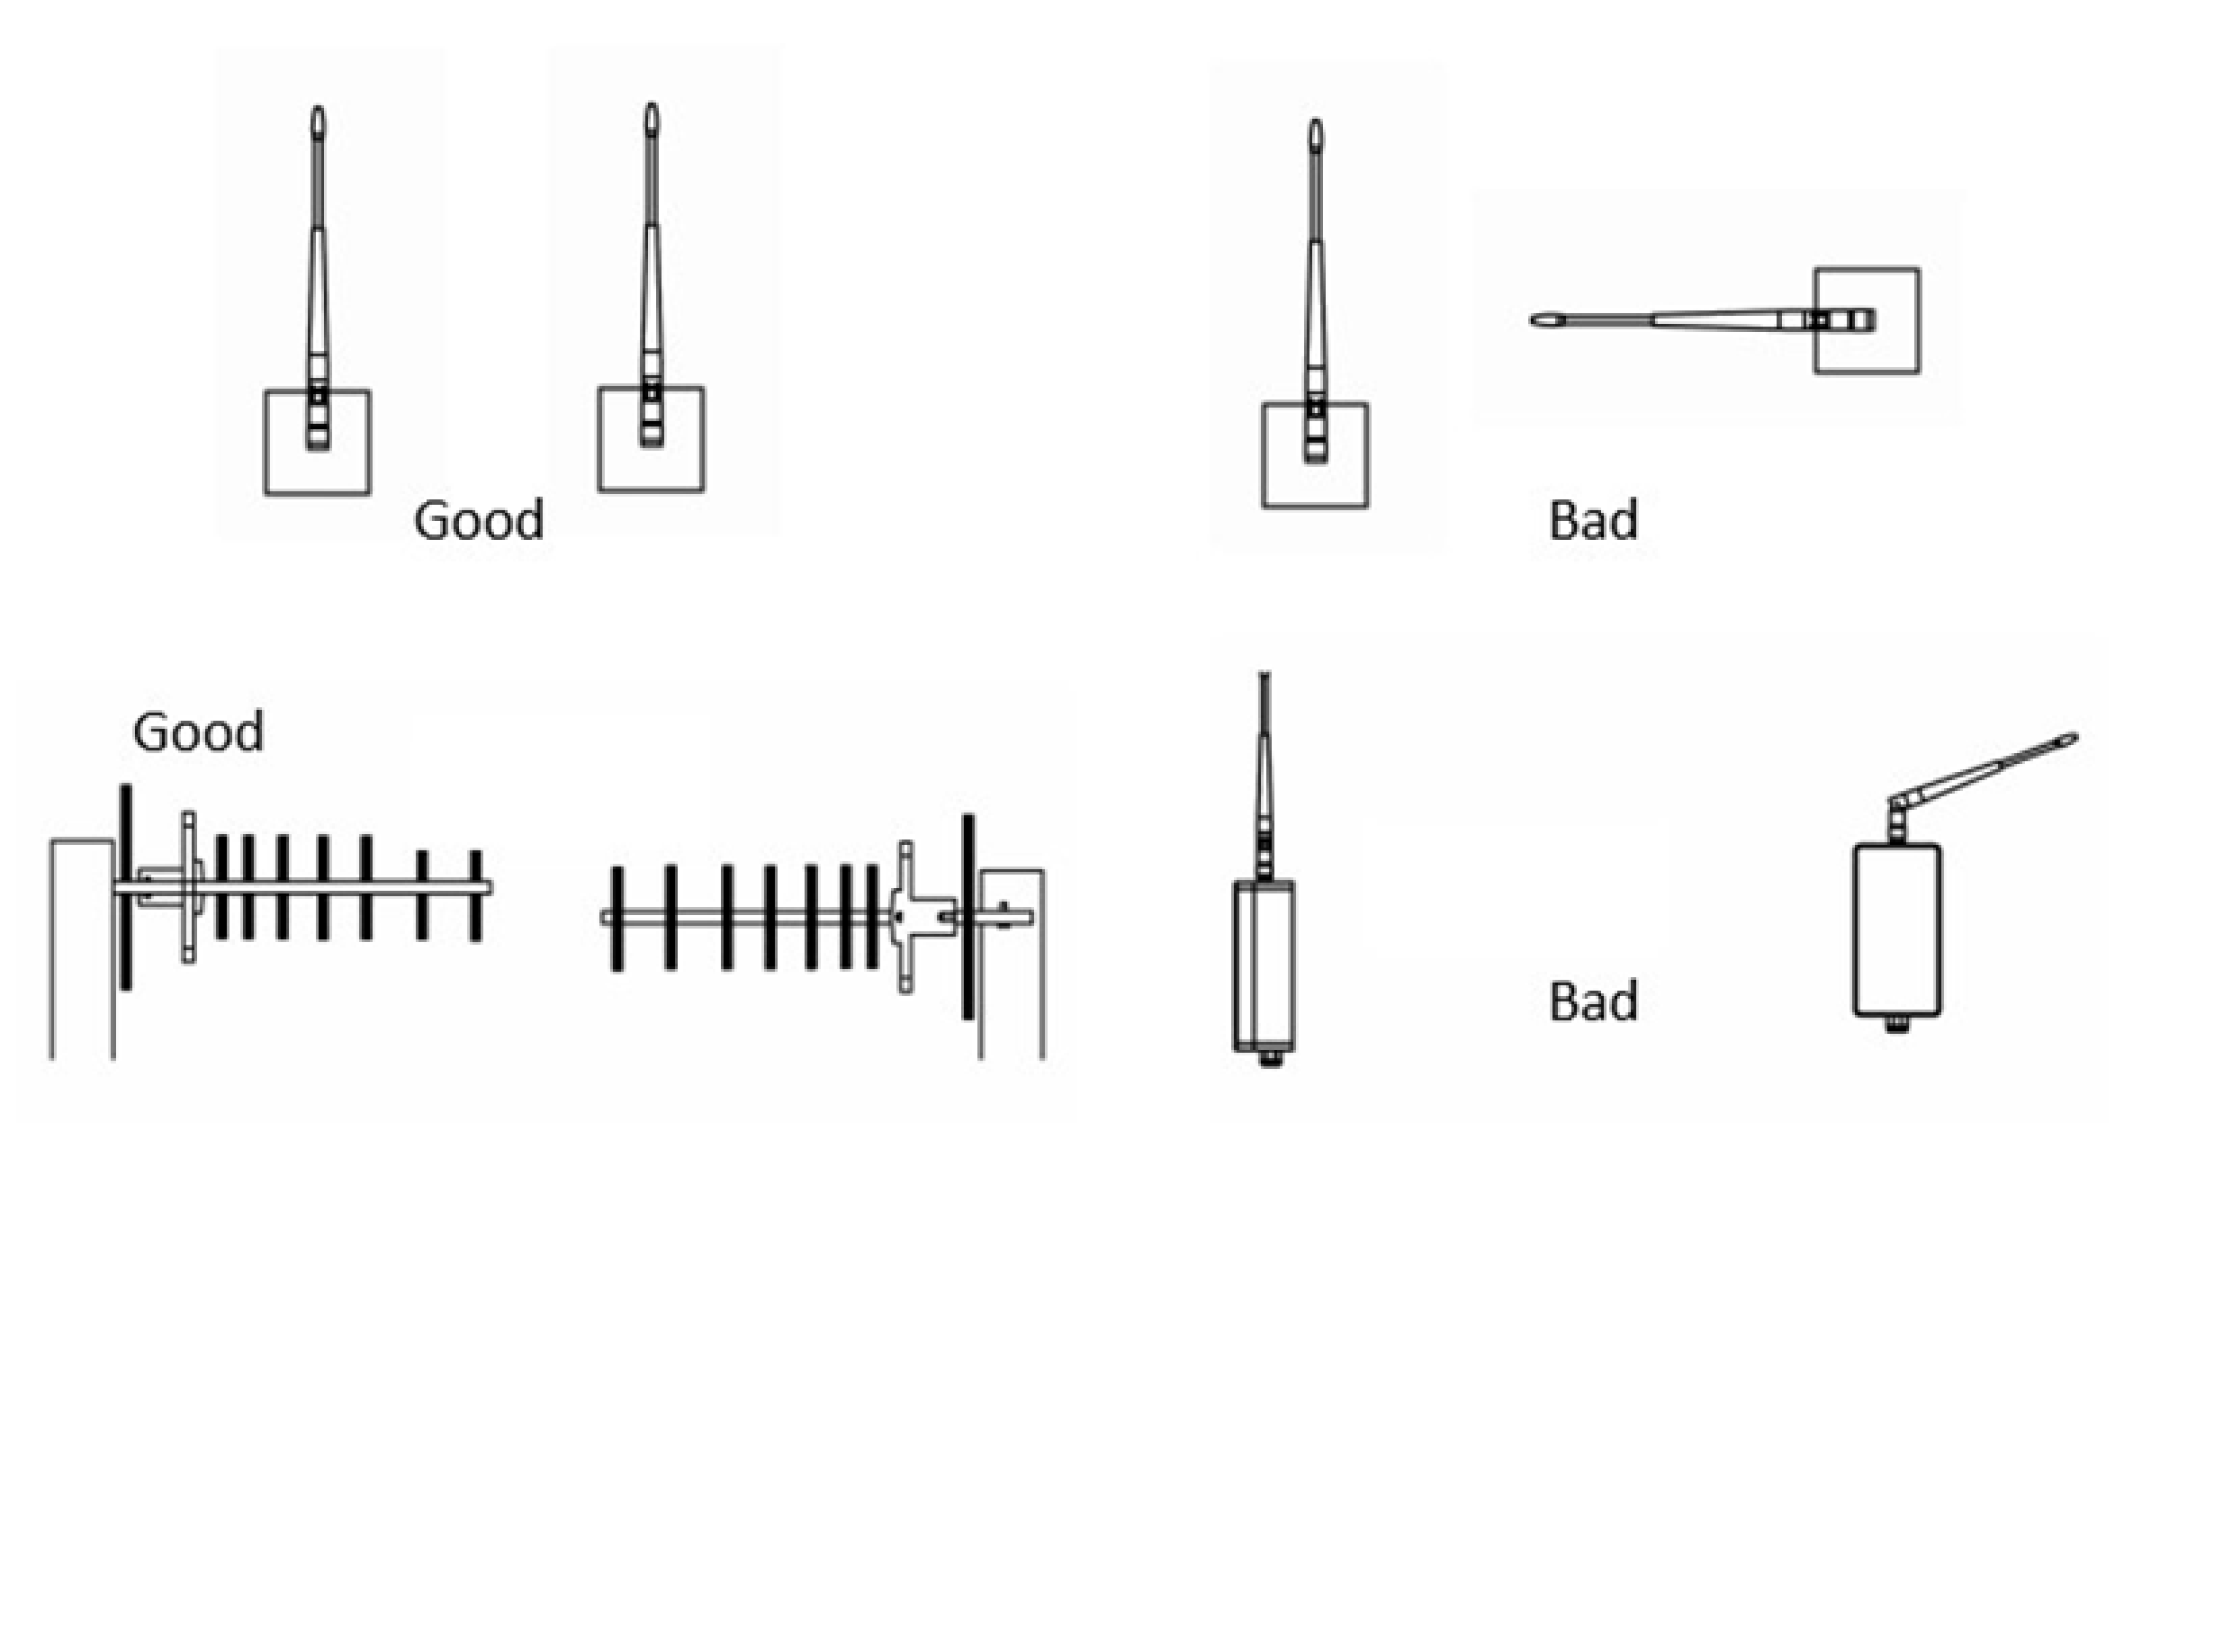 Antenna orentation